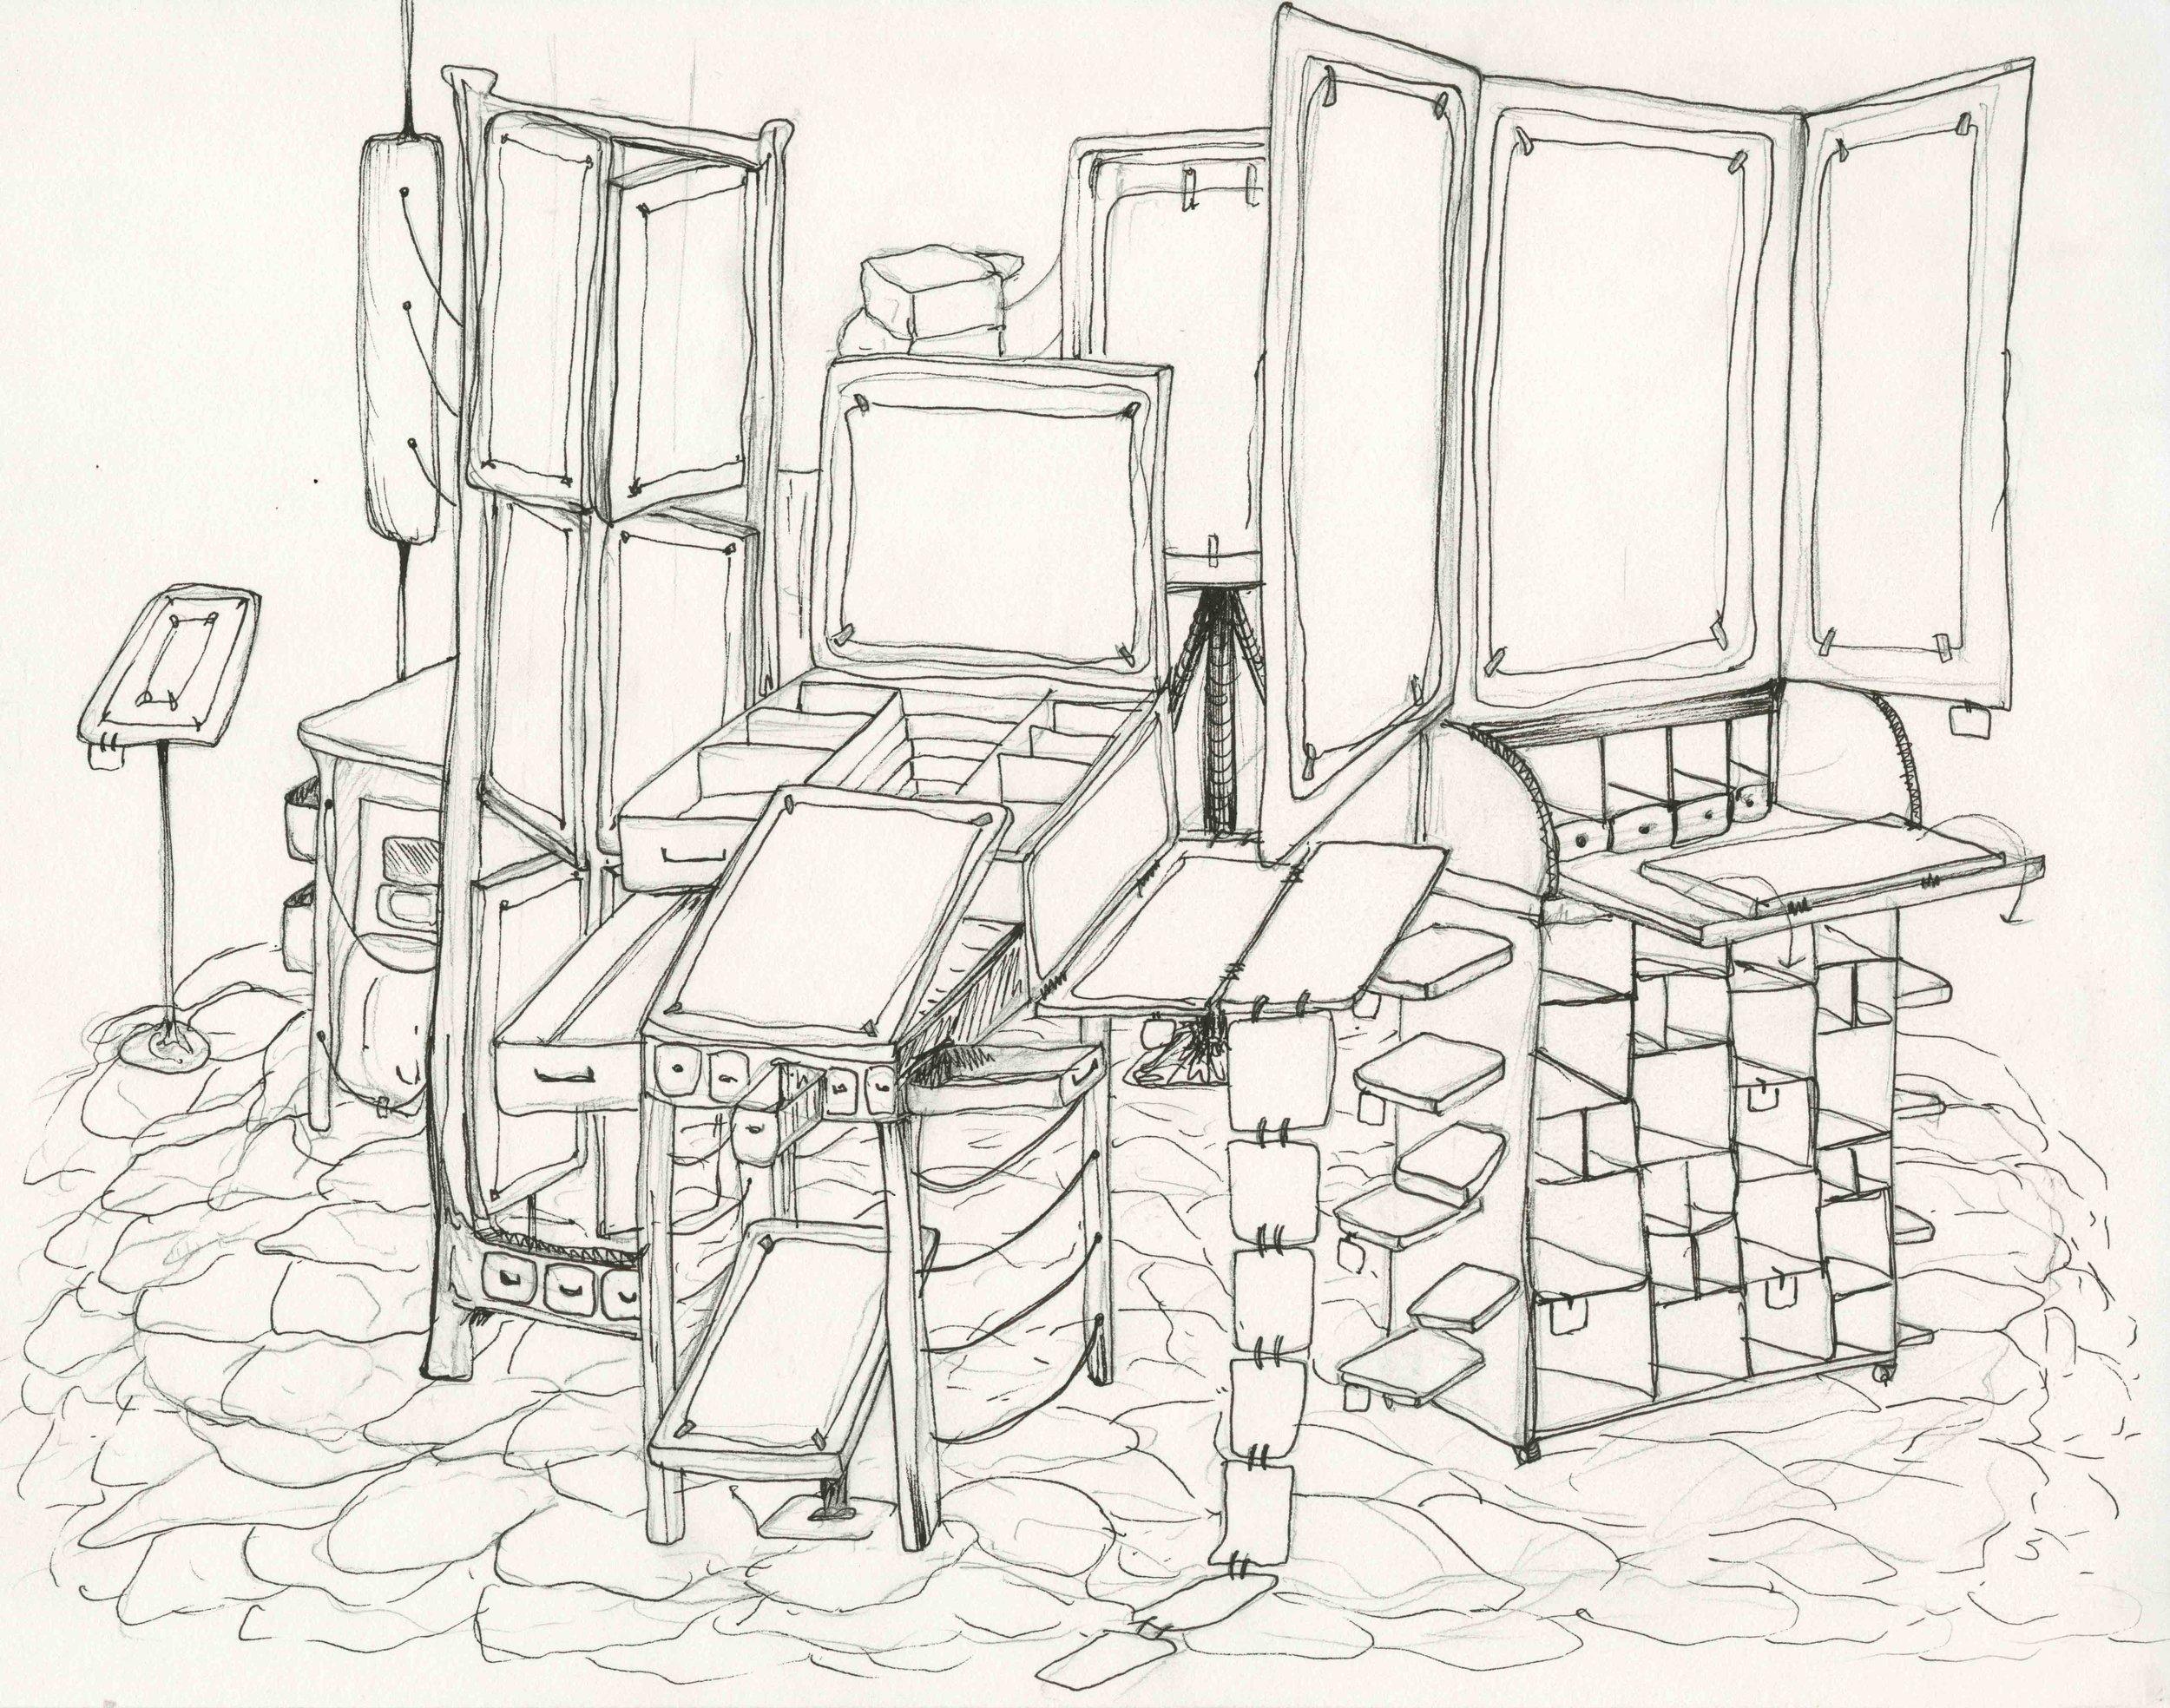 Cabinet_3_small.jpg